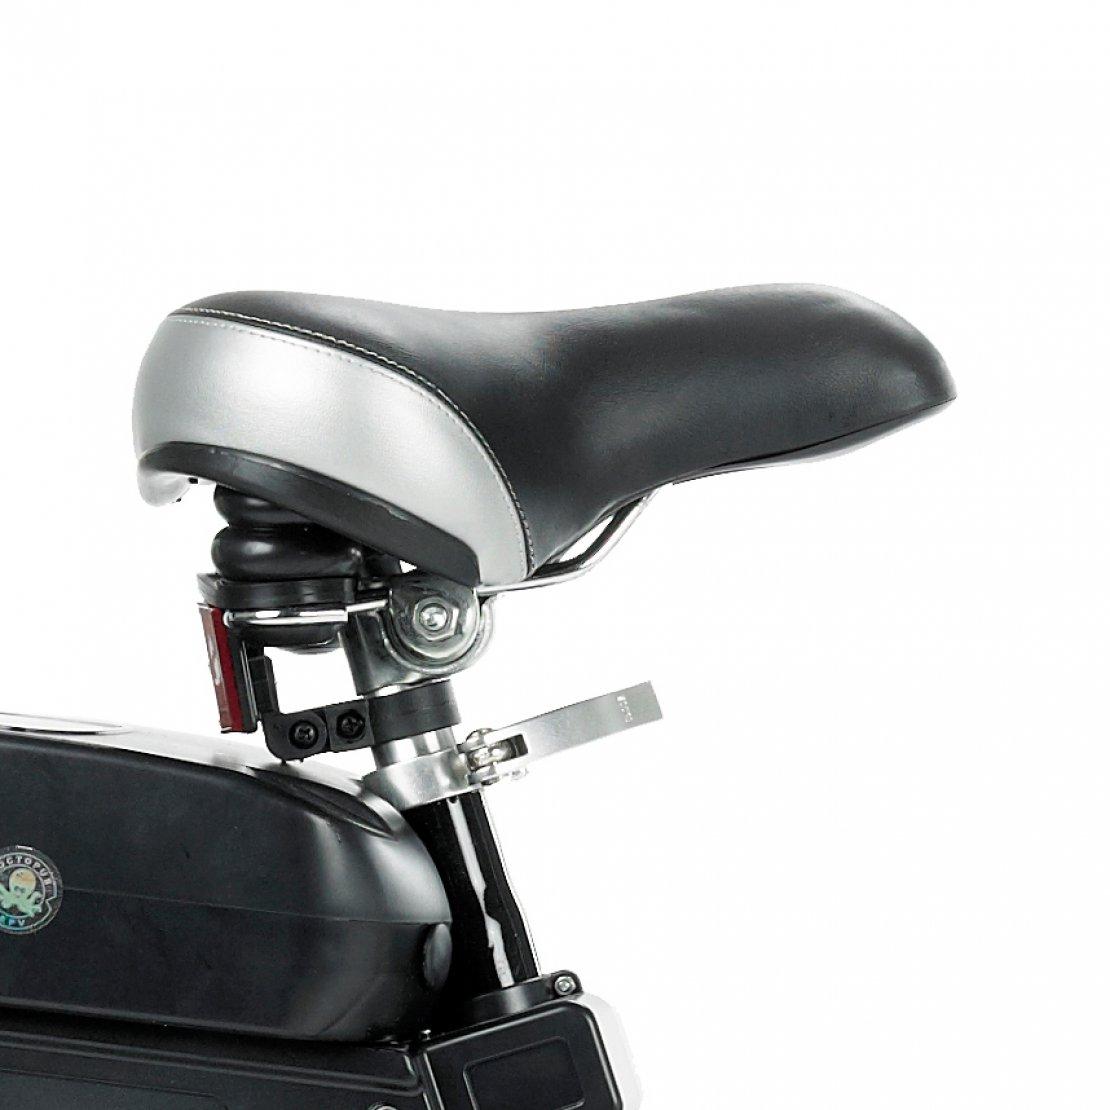 Viking E Go 6 Speed 20 Wheel Alloy Folding Electric Bike Black Evo 24v Wiring Diagram Bikes